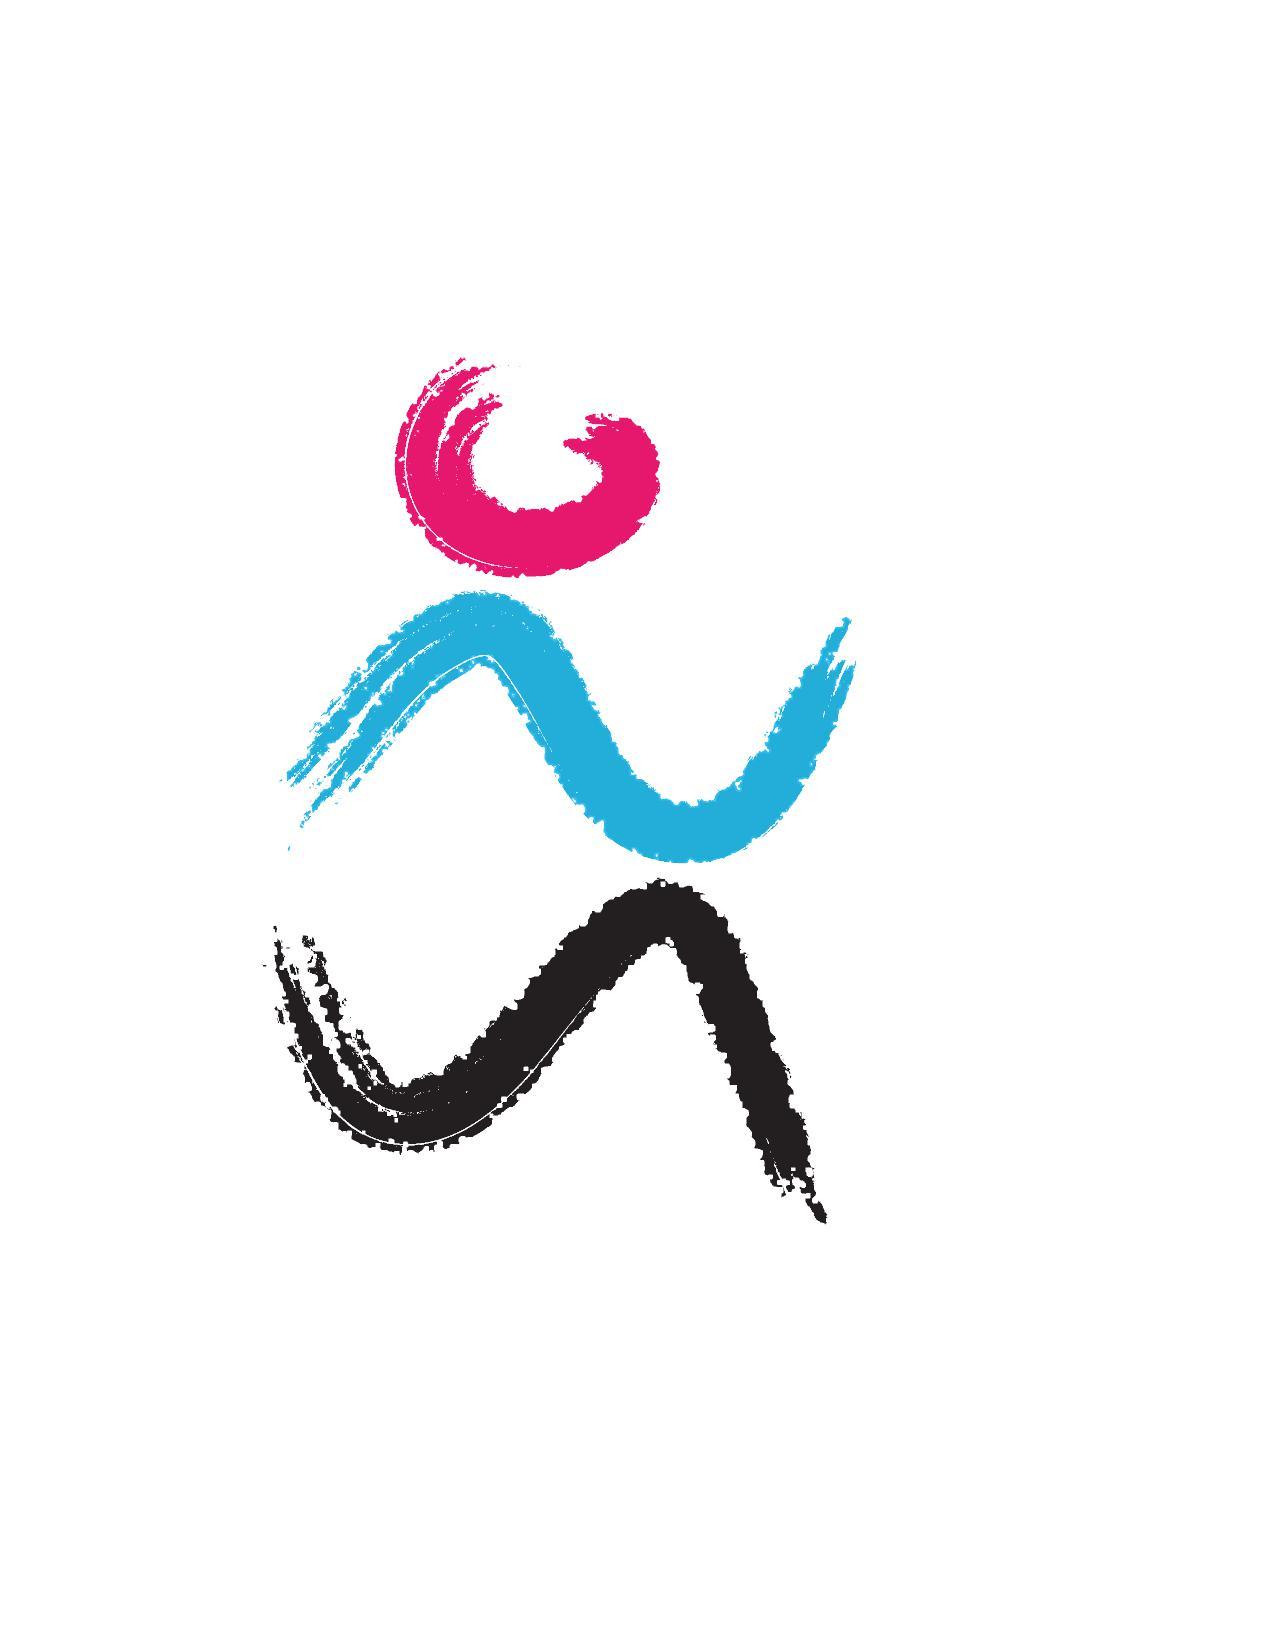 MLS_logo - new[1] copy_000001.jpg